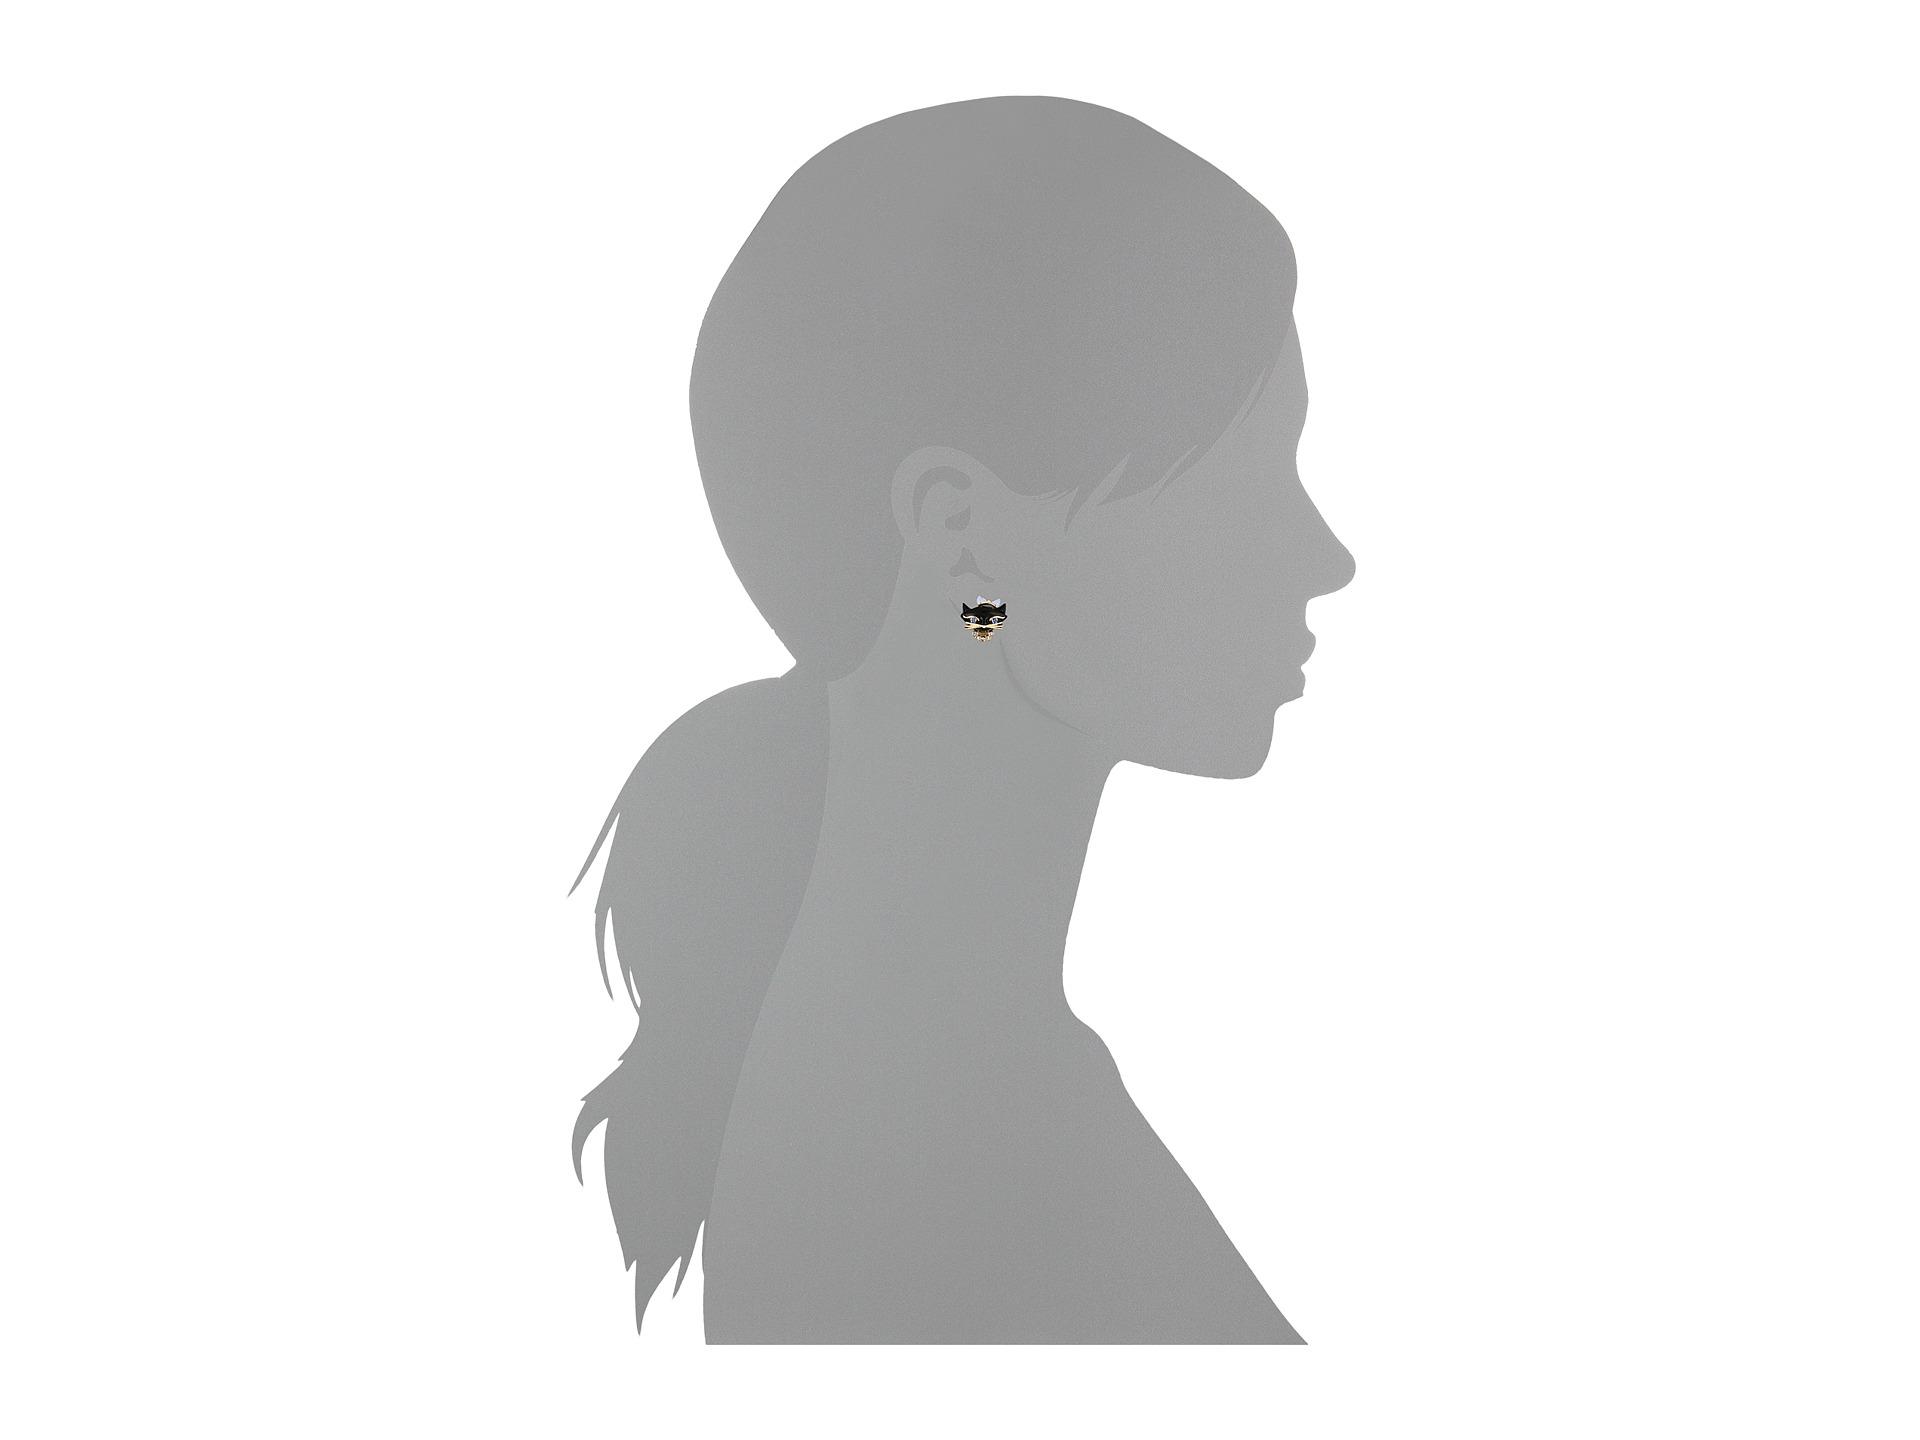 Kate Spade New York Height Jazz Things Up Cat Studs Earrings